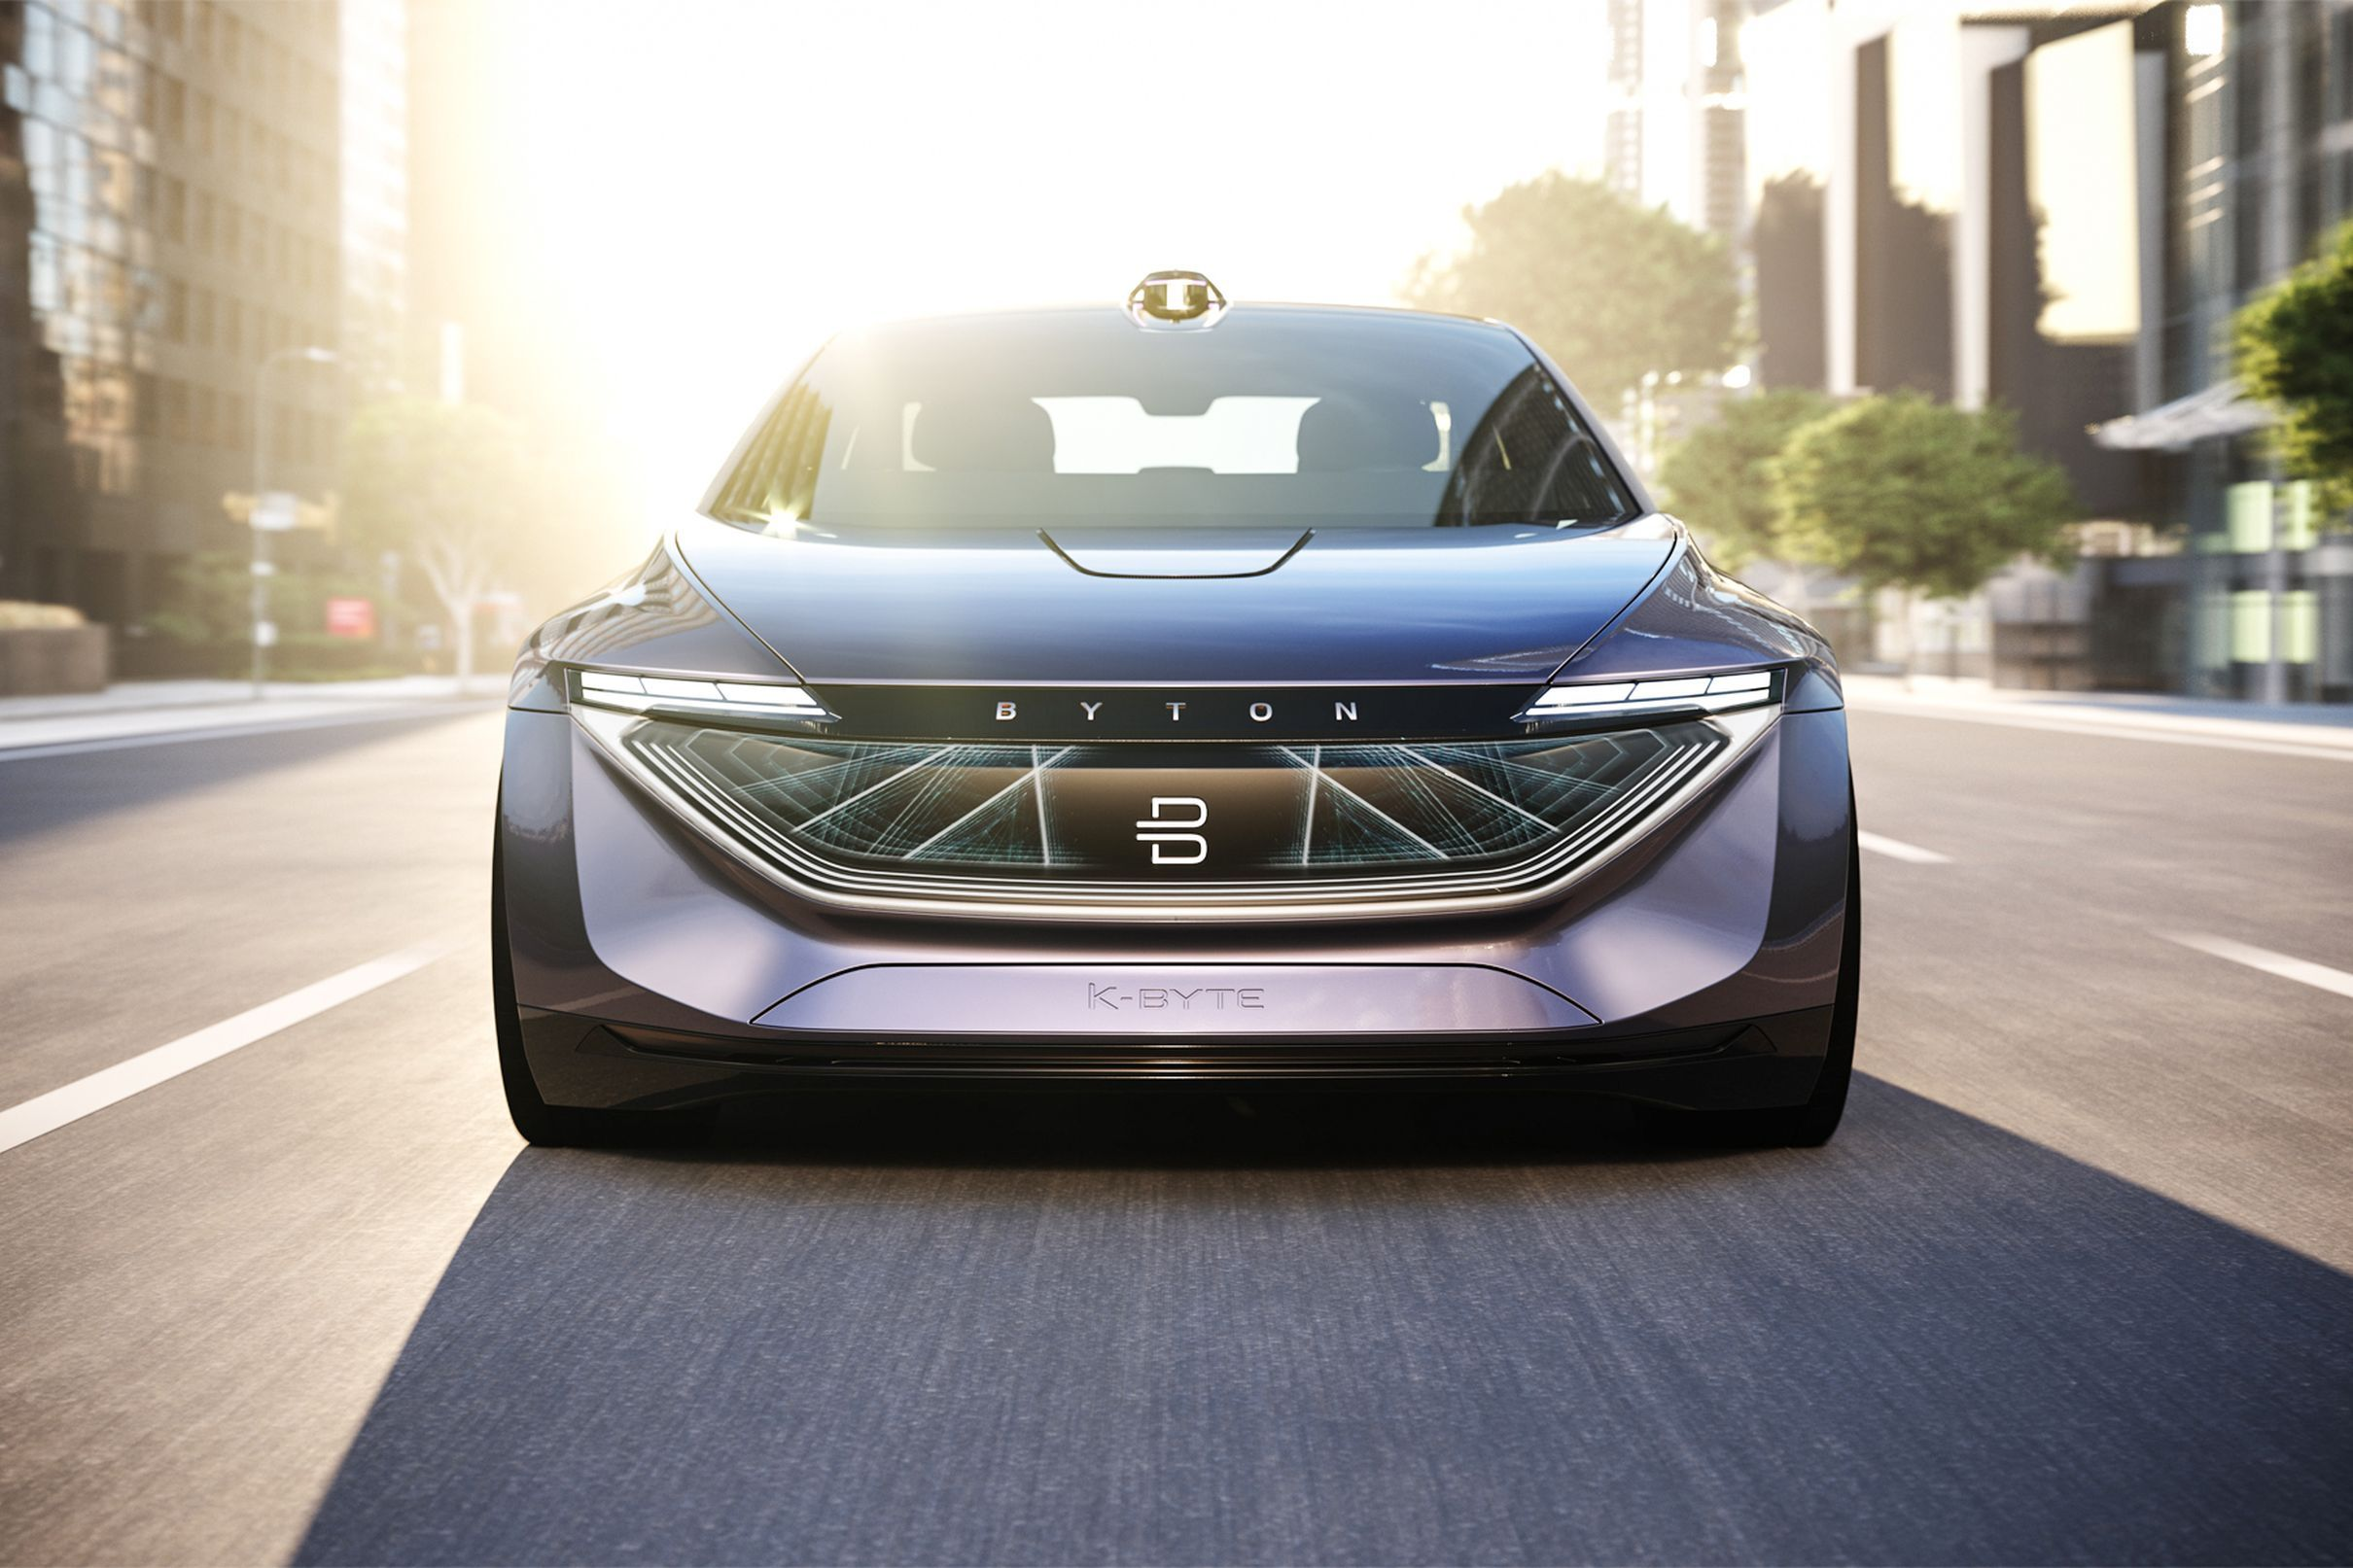 Byton teases a fully autonomous electric sedan due in 2021